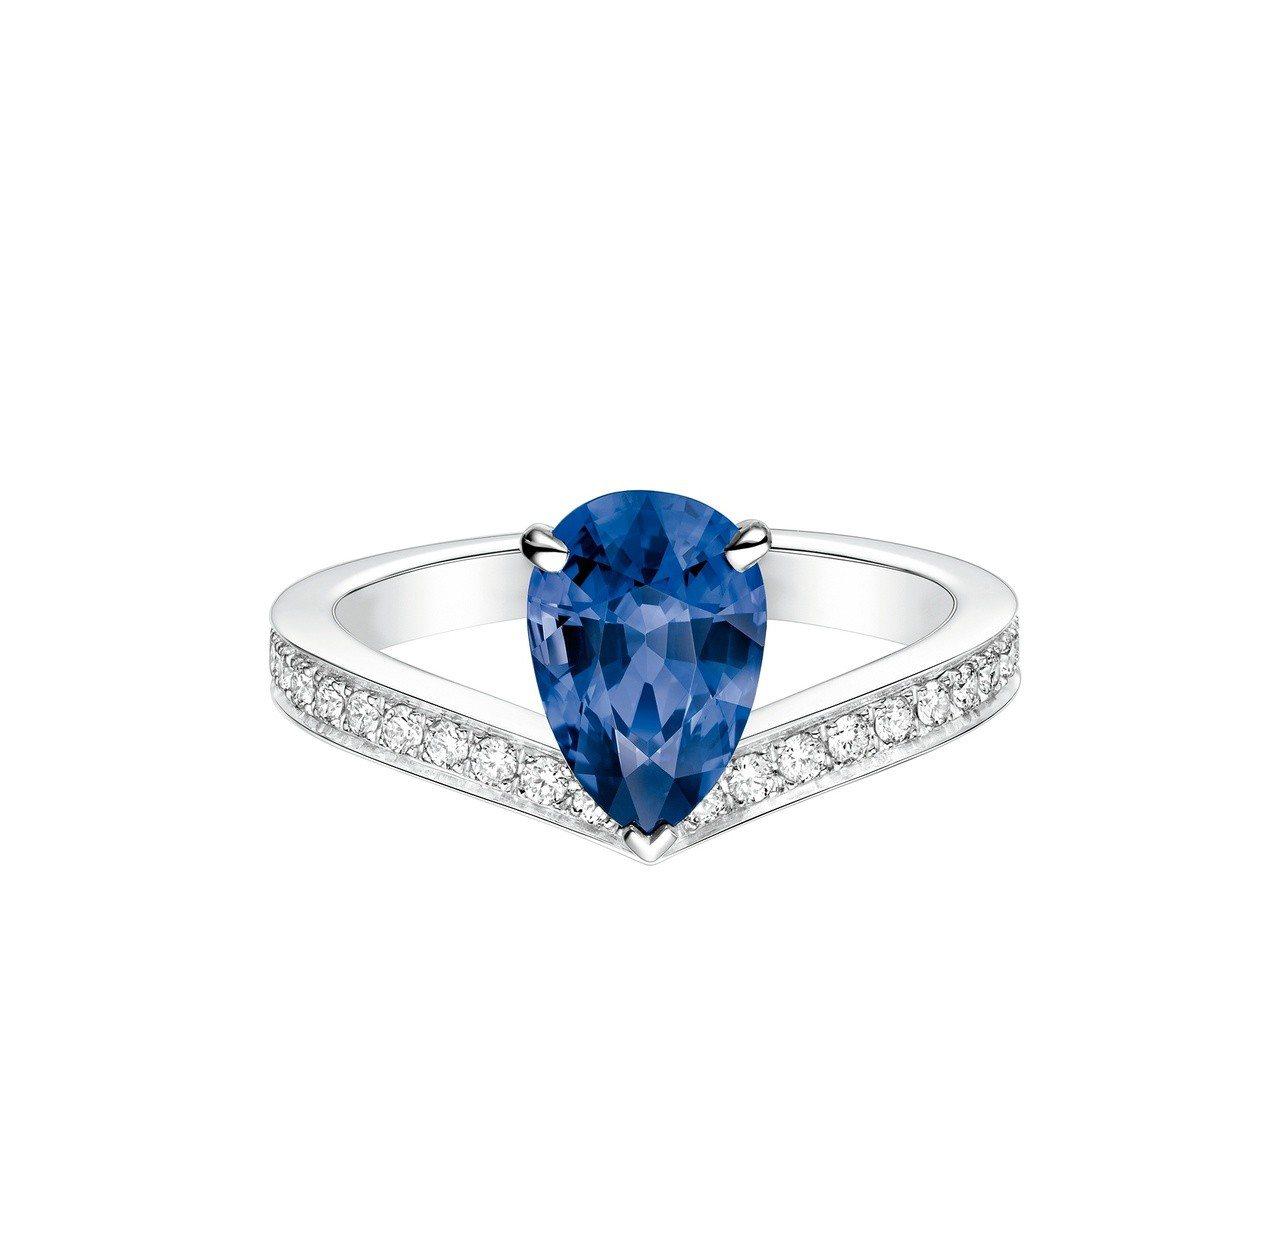 Chaumet Joséphine Aigrette 鉑金單鑽戒指,價格店洽。...